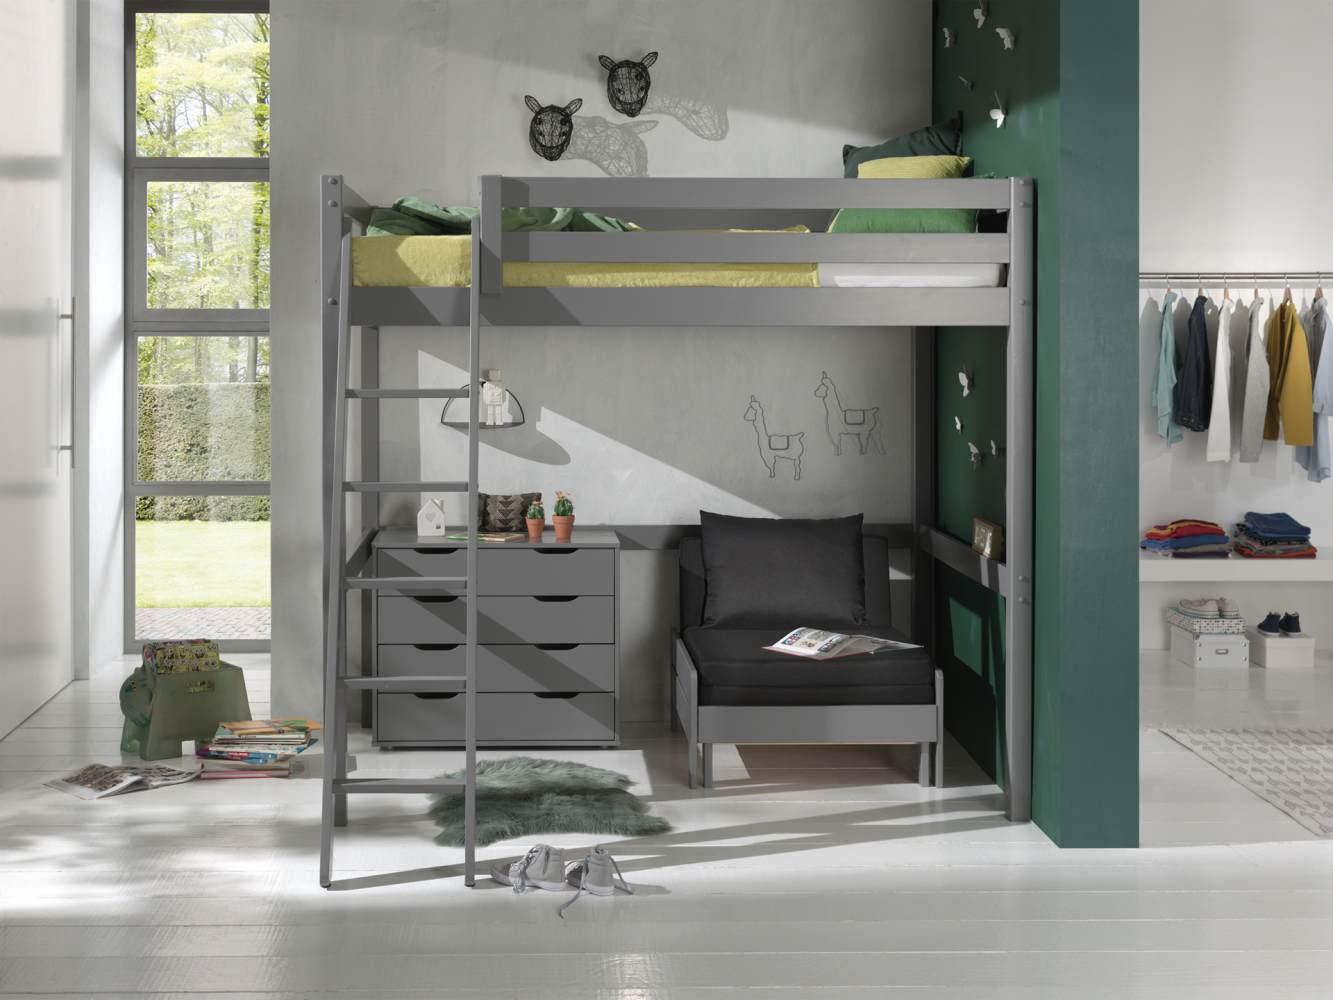 Vipack Hochbett grau 140 x 200 cm inkl. Sesselbett und Schubladen Kommode Bild 1